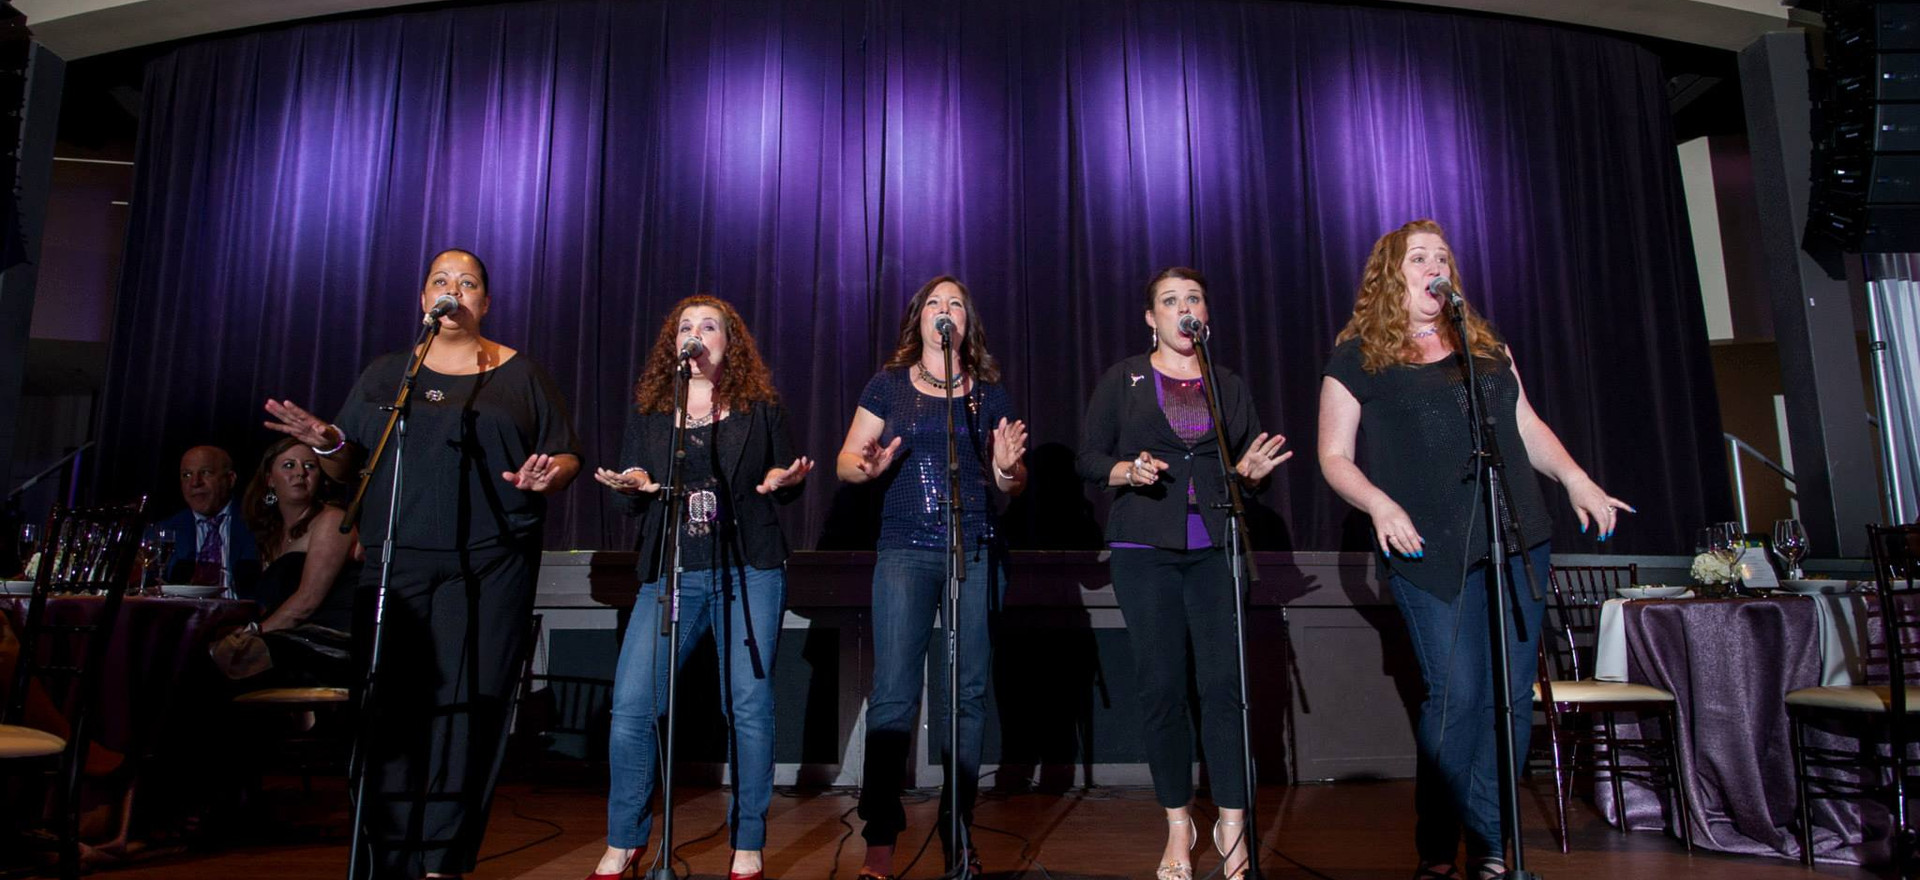 The Divas at Blue Ocean Music Hall